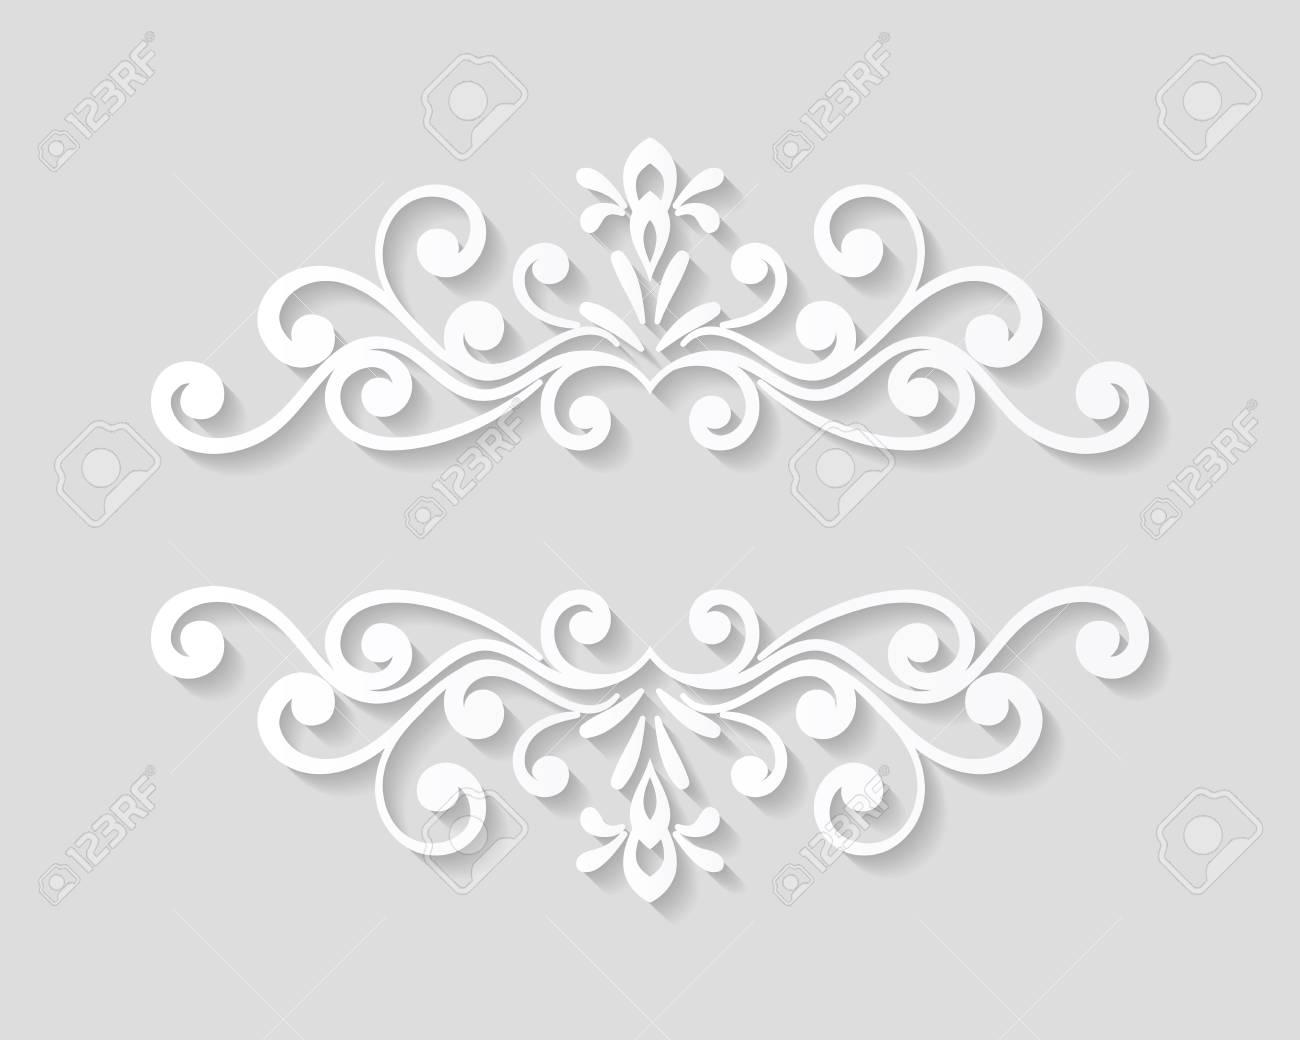 Elegant Paper Retro Floral Border. Hand Drawn Vintage Design Template For  Banner, Greeting Card